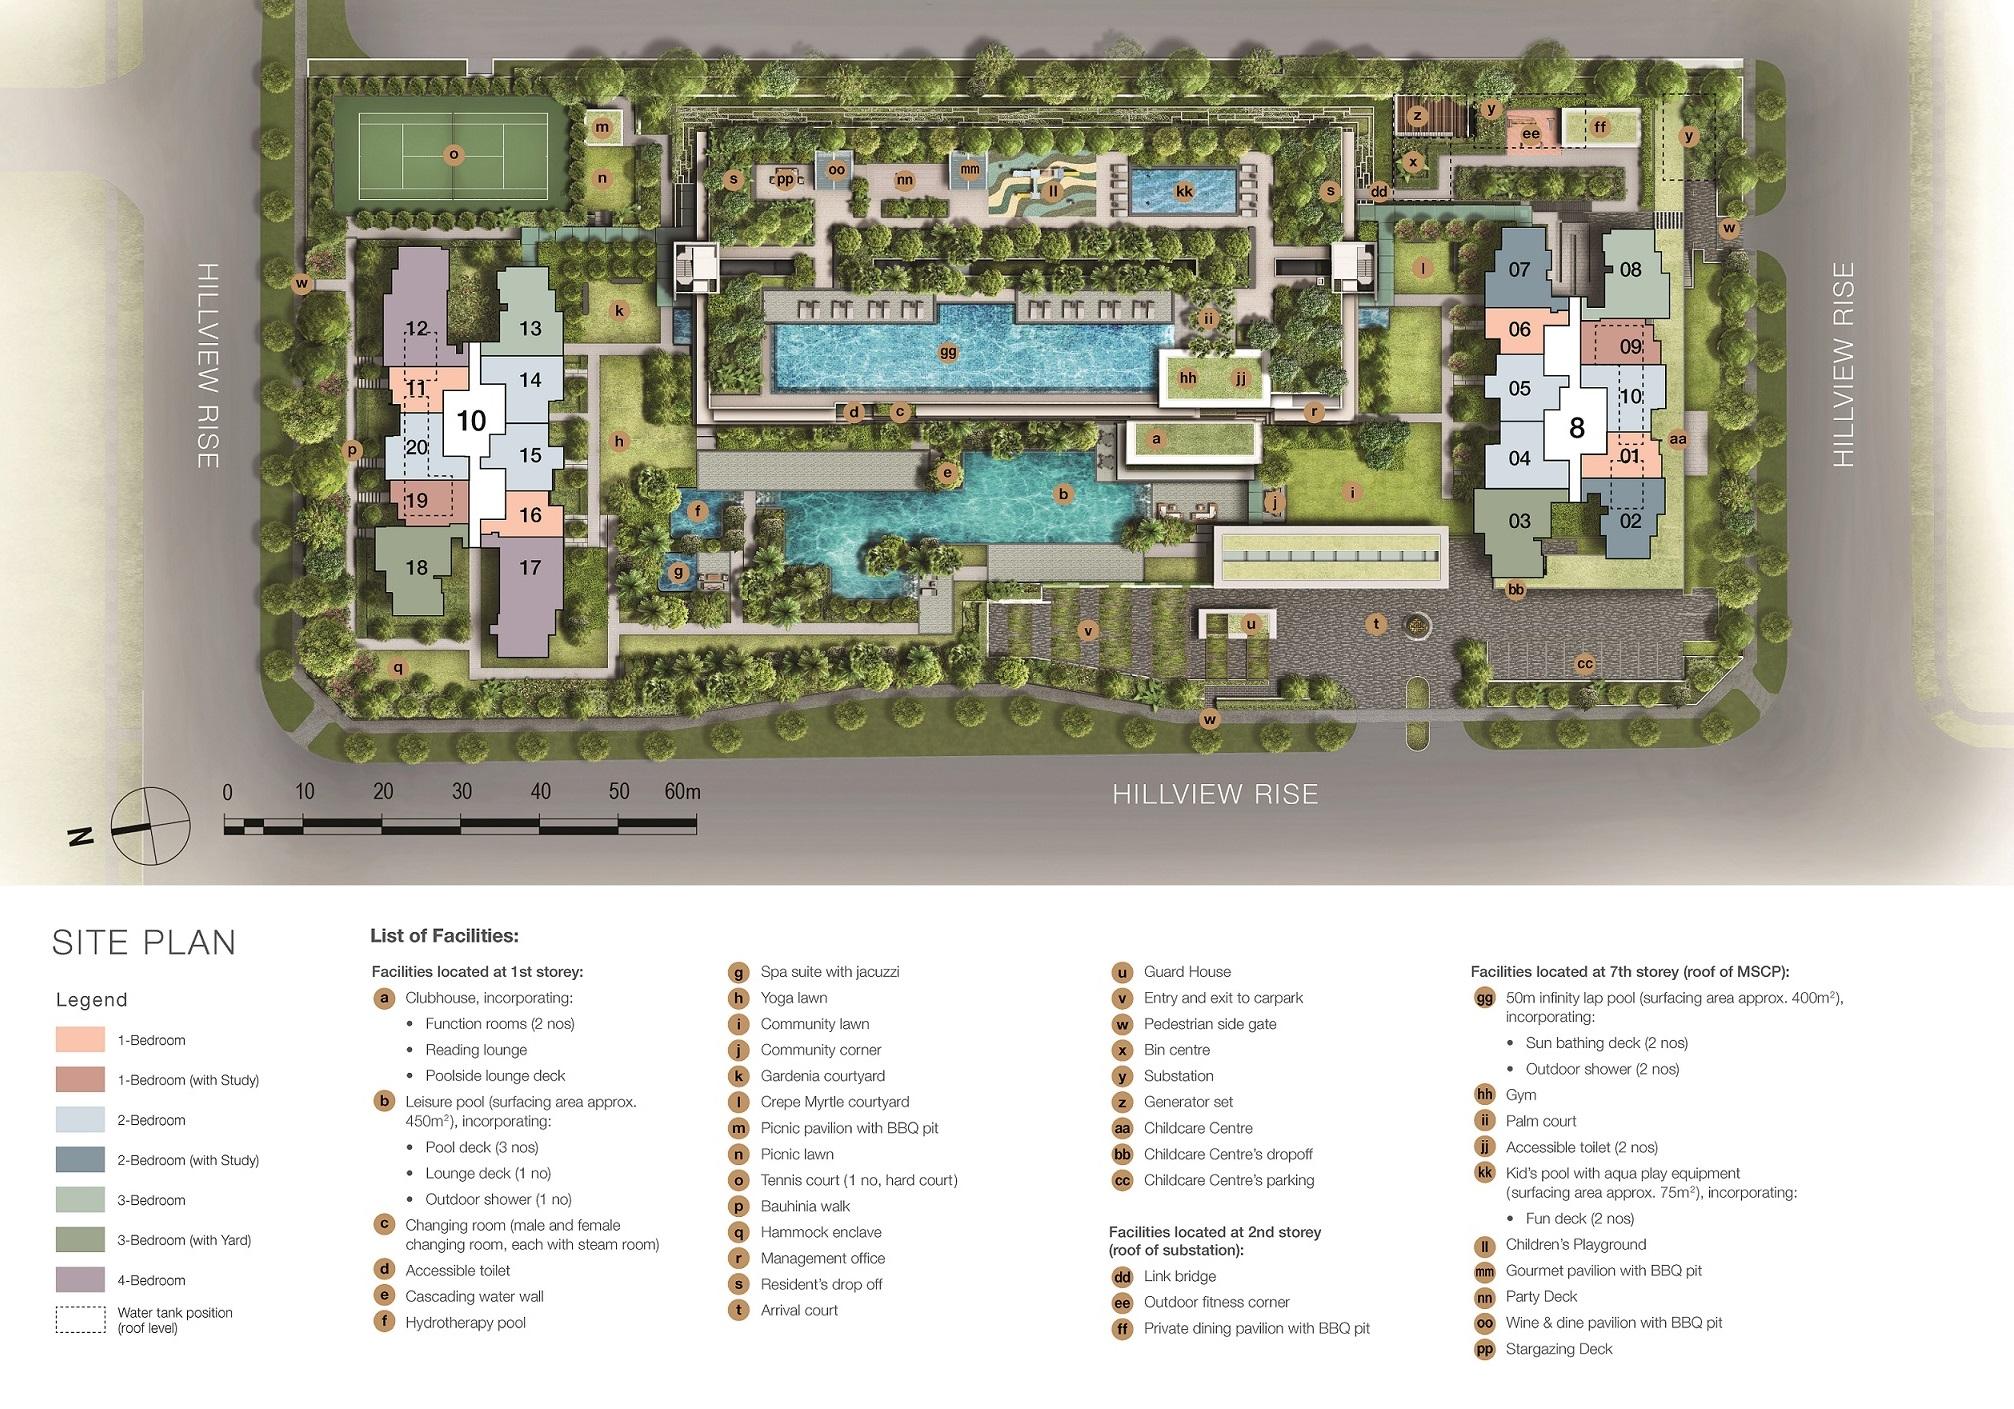 Midwood site plan